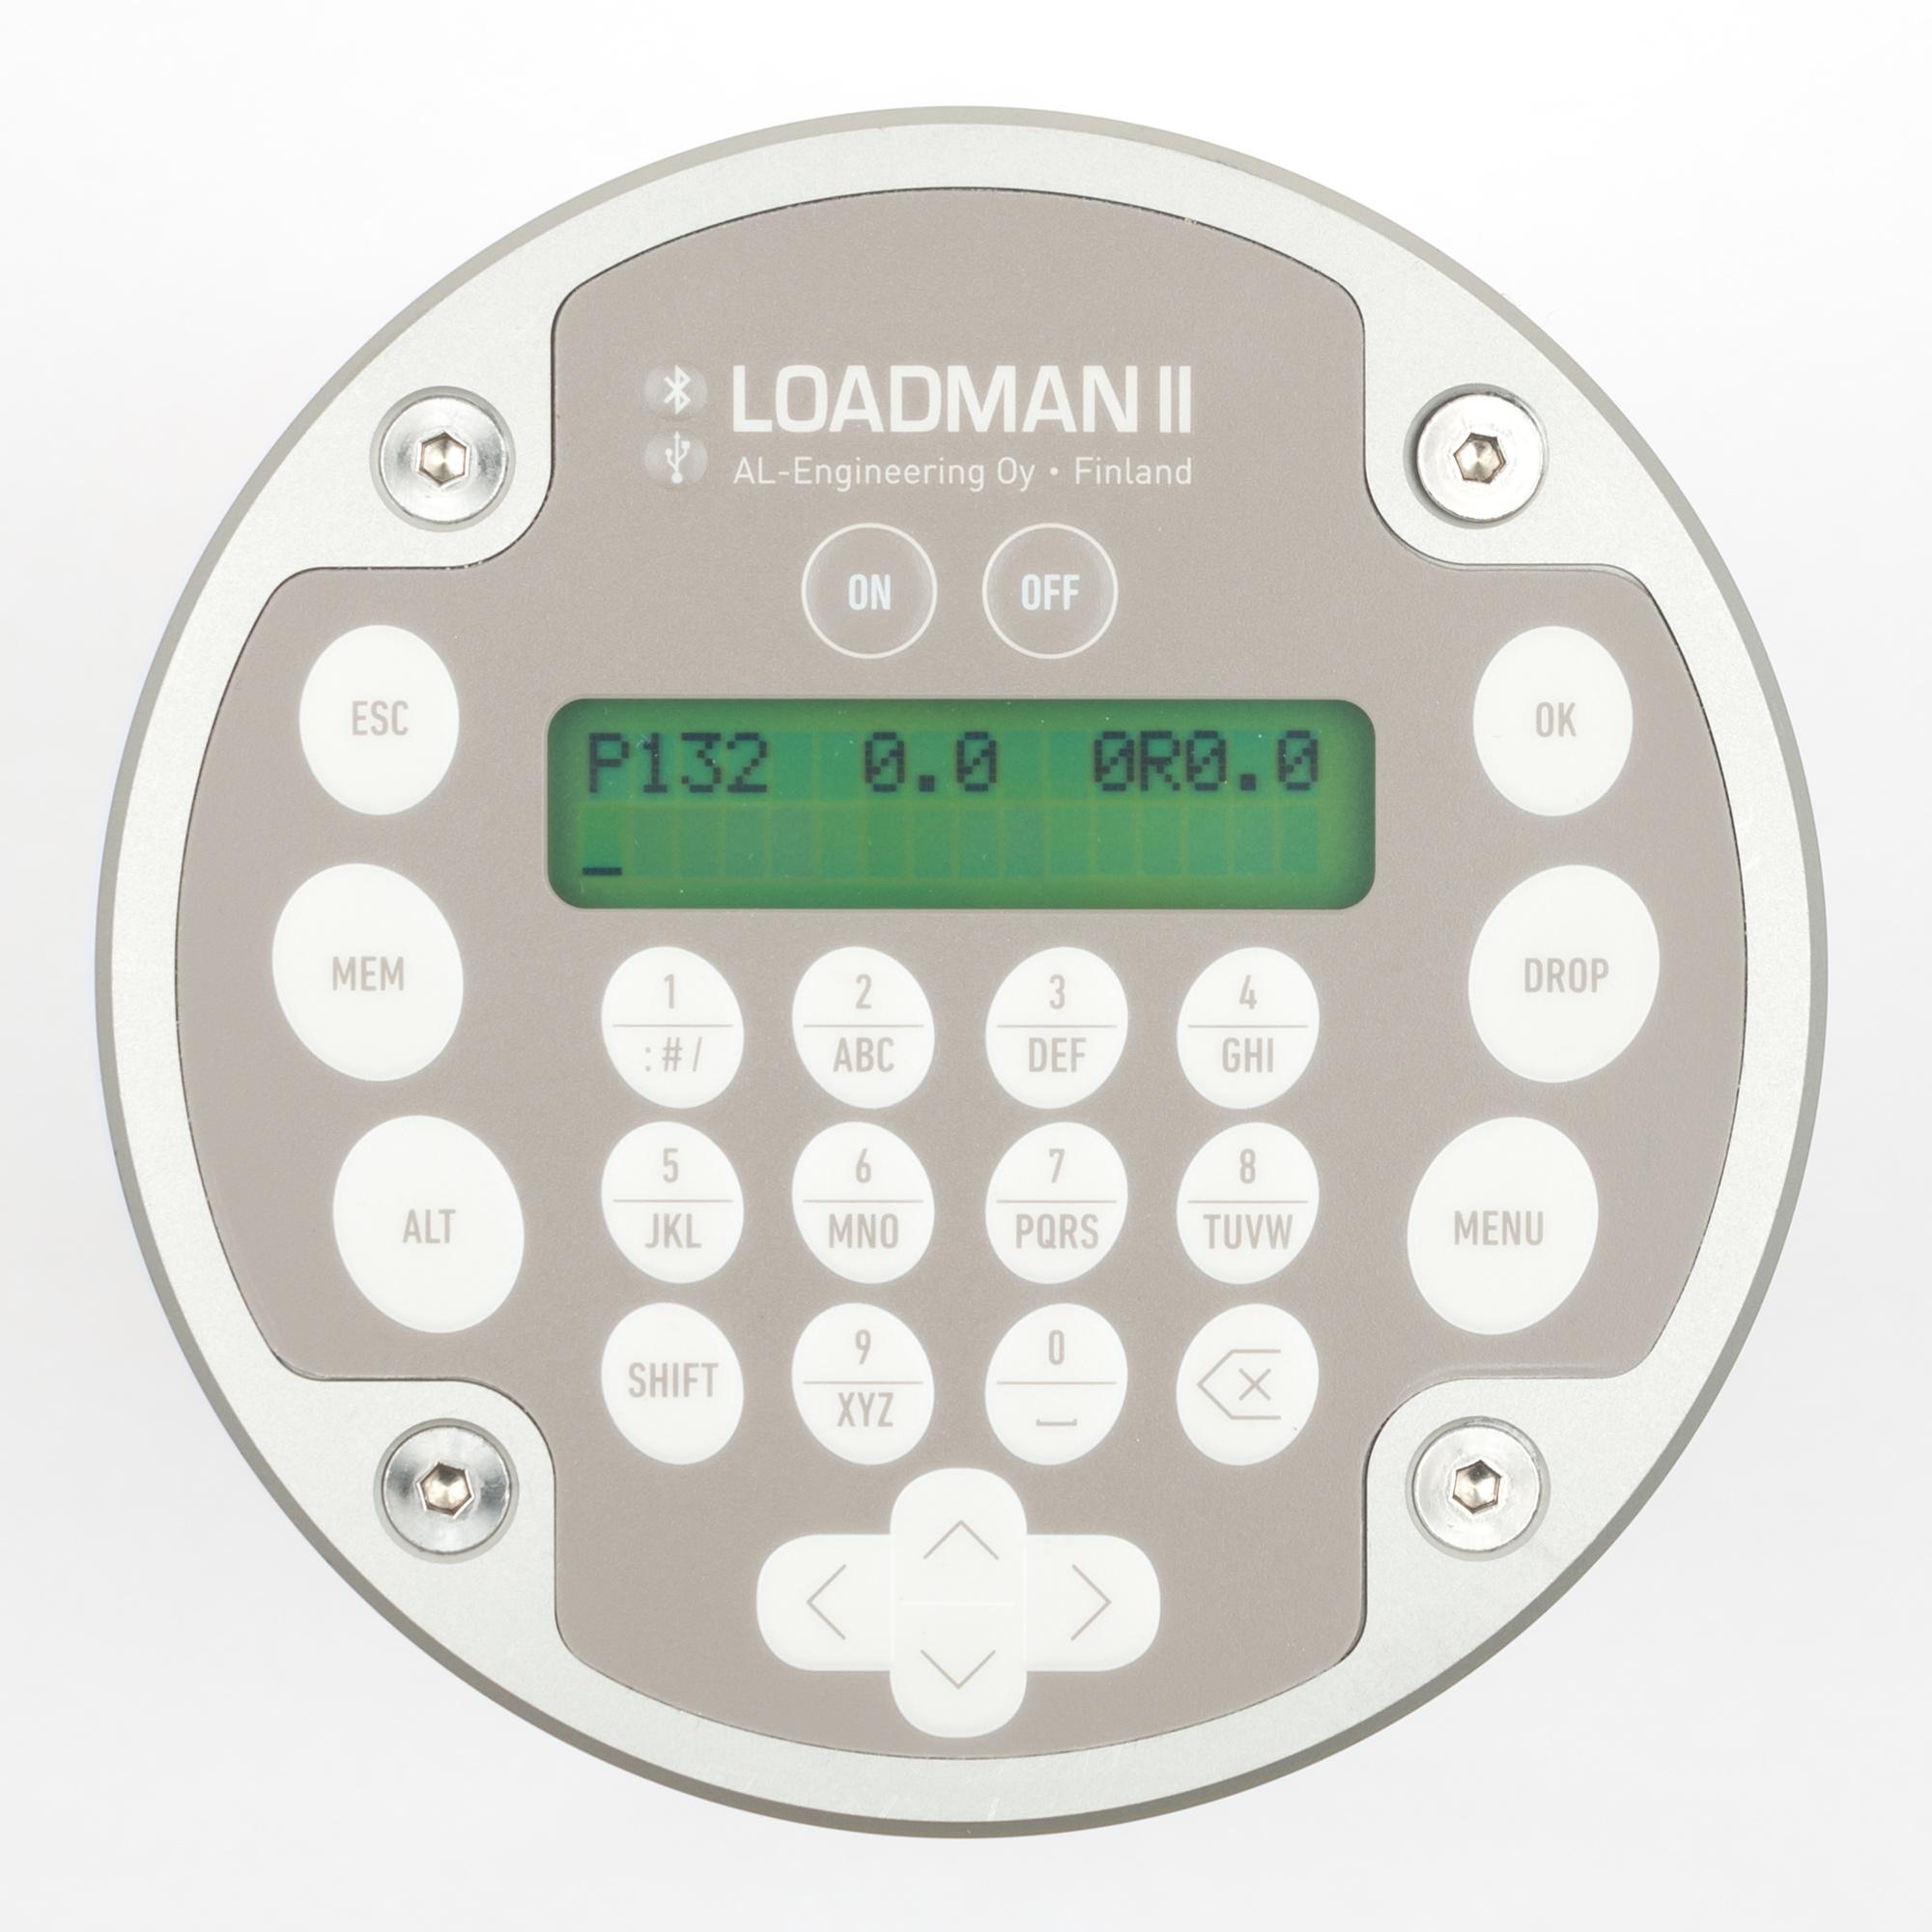 Loadman 2